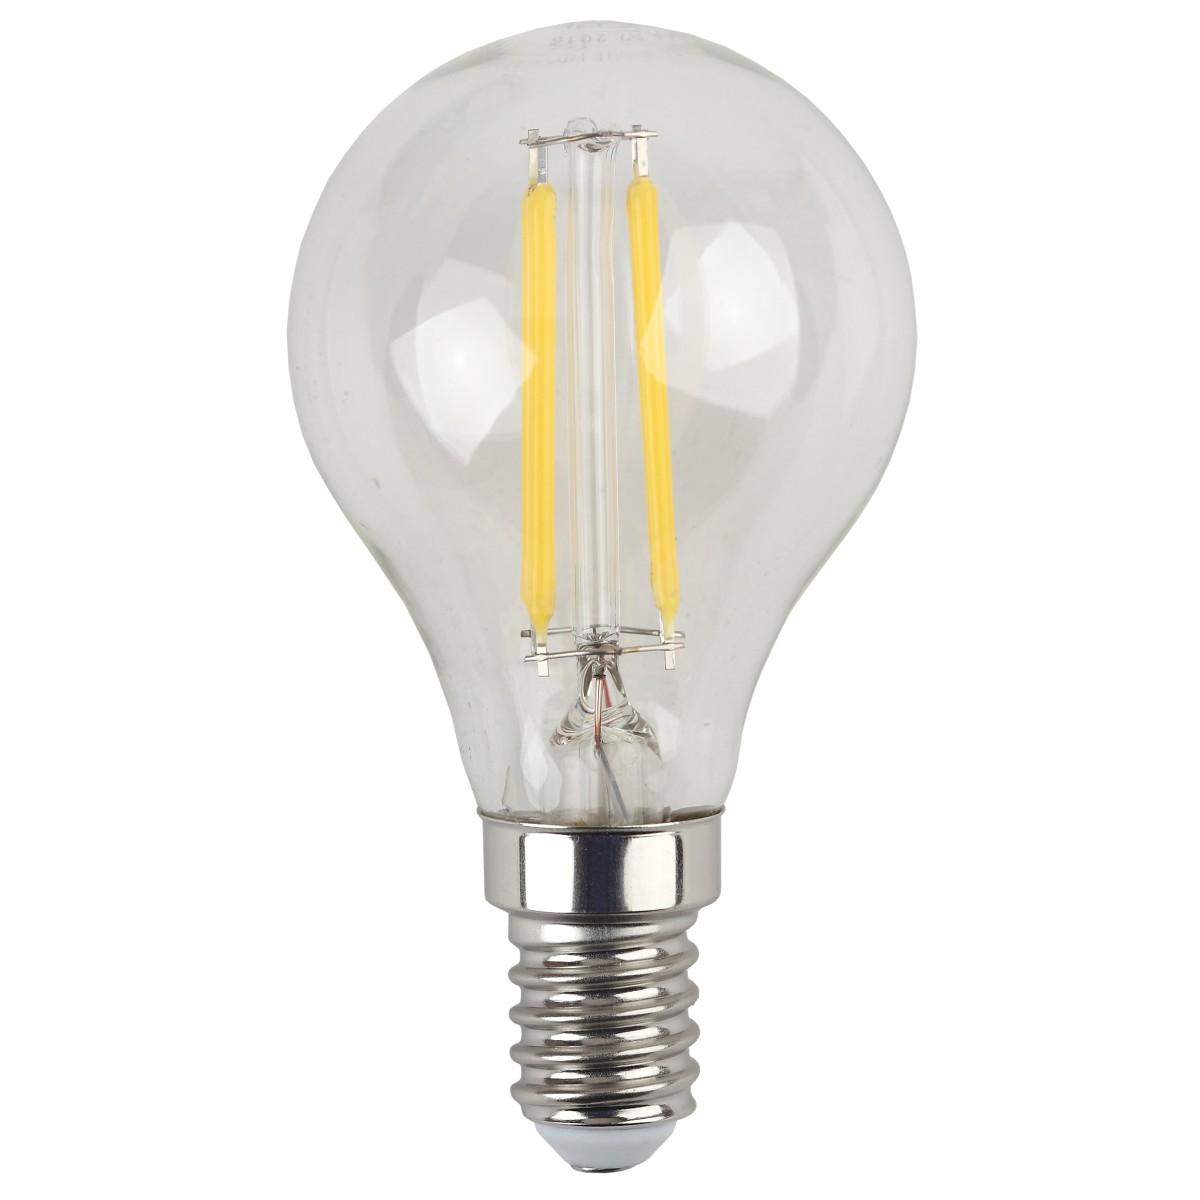 Лампа Эра  E14 5 Вт шар 545 Лм нейтральный